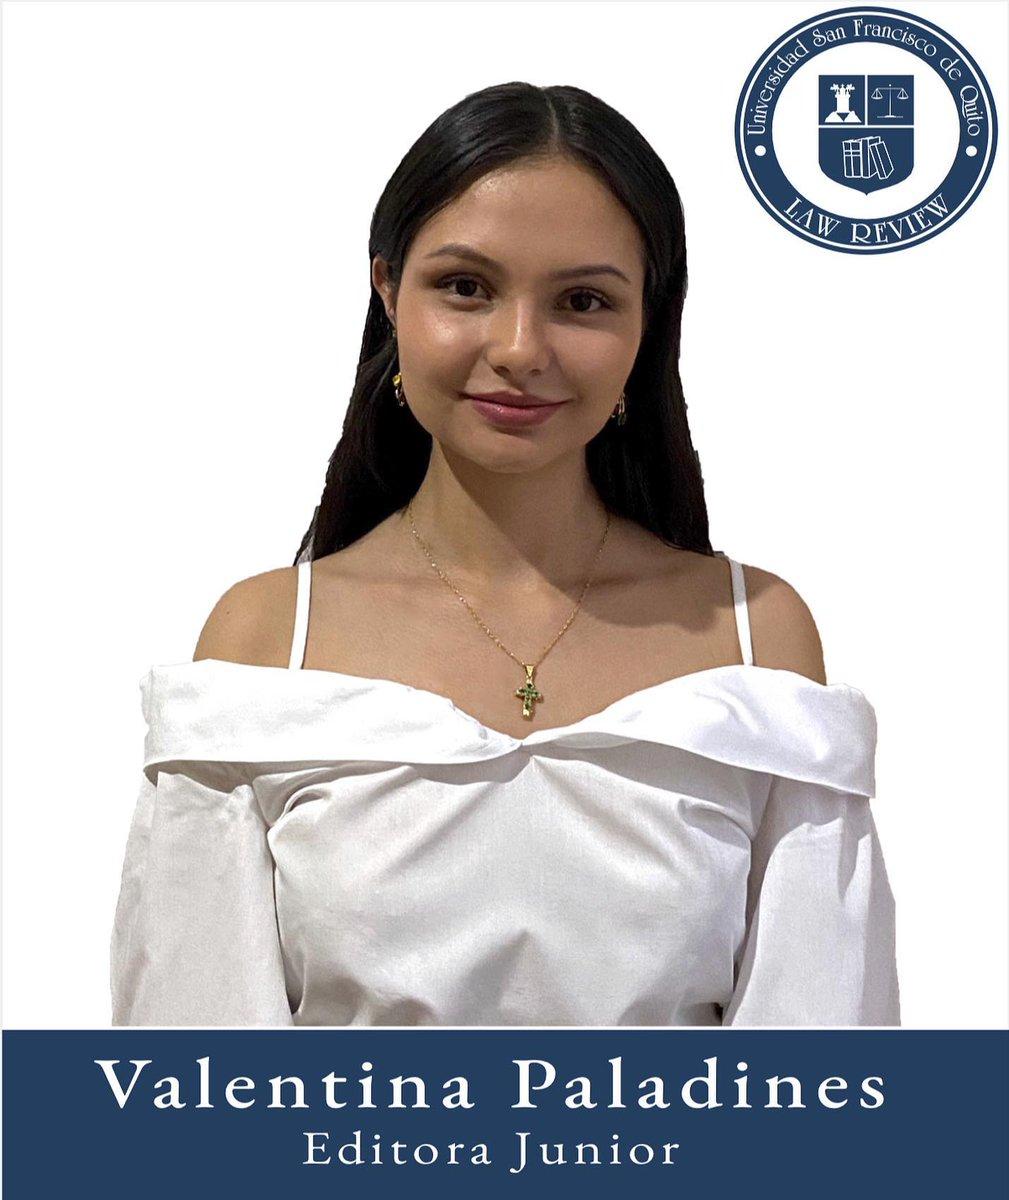 Valentina Paladines  Editora Junior  Sexto semestre Colegio de Jurisprudencia Universidad San Francisco de Quito https://t.co/kKlhvP8MgL